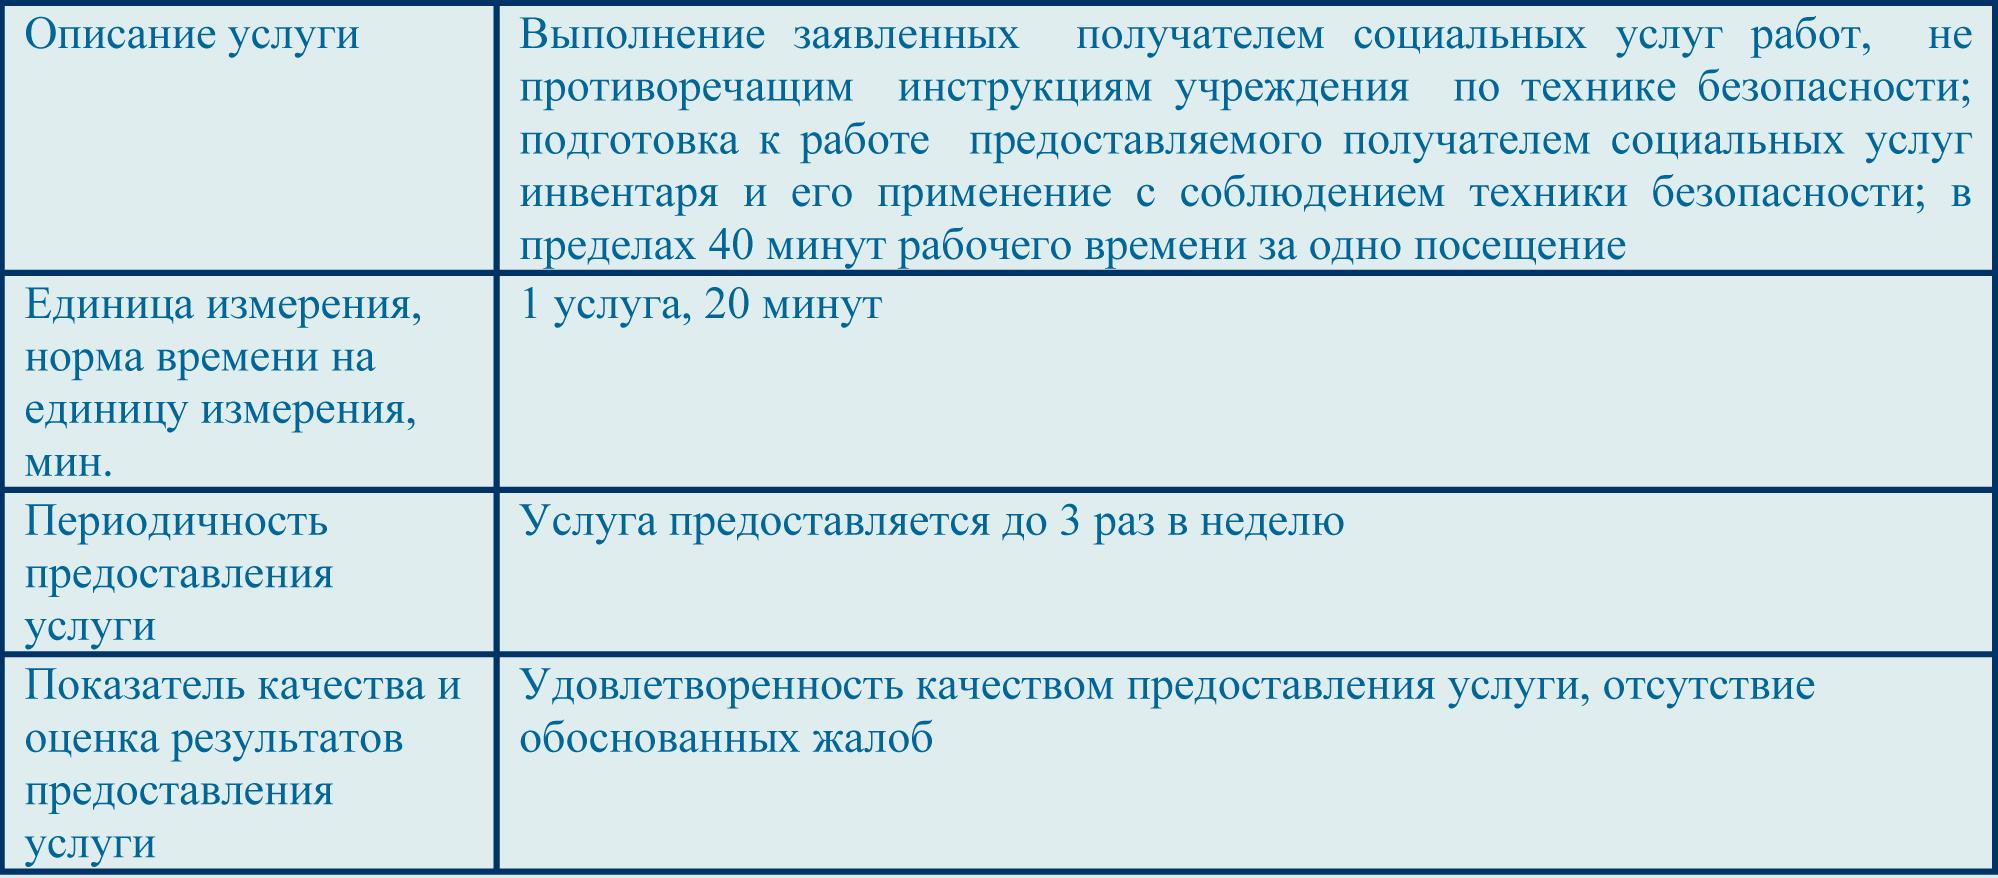 opisanie-uslug-csonekl6